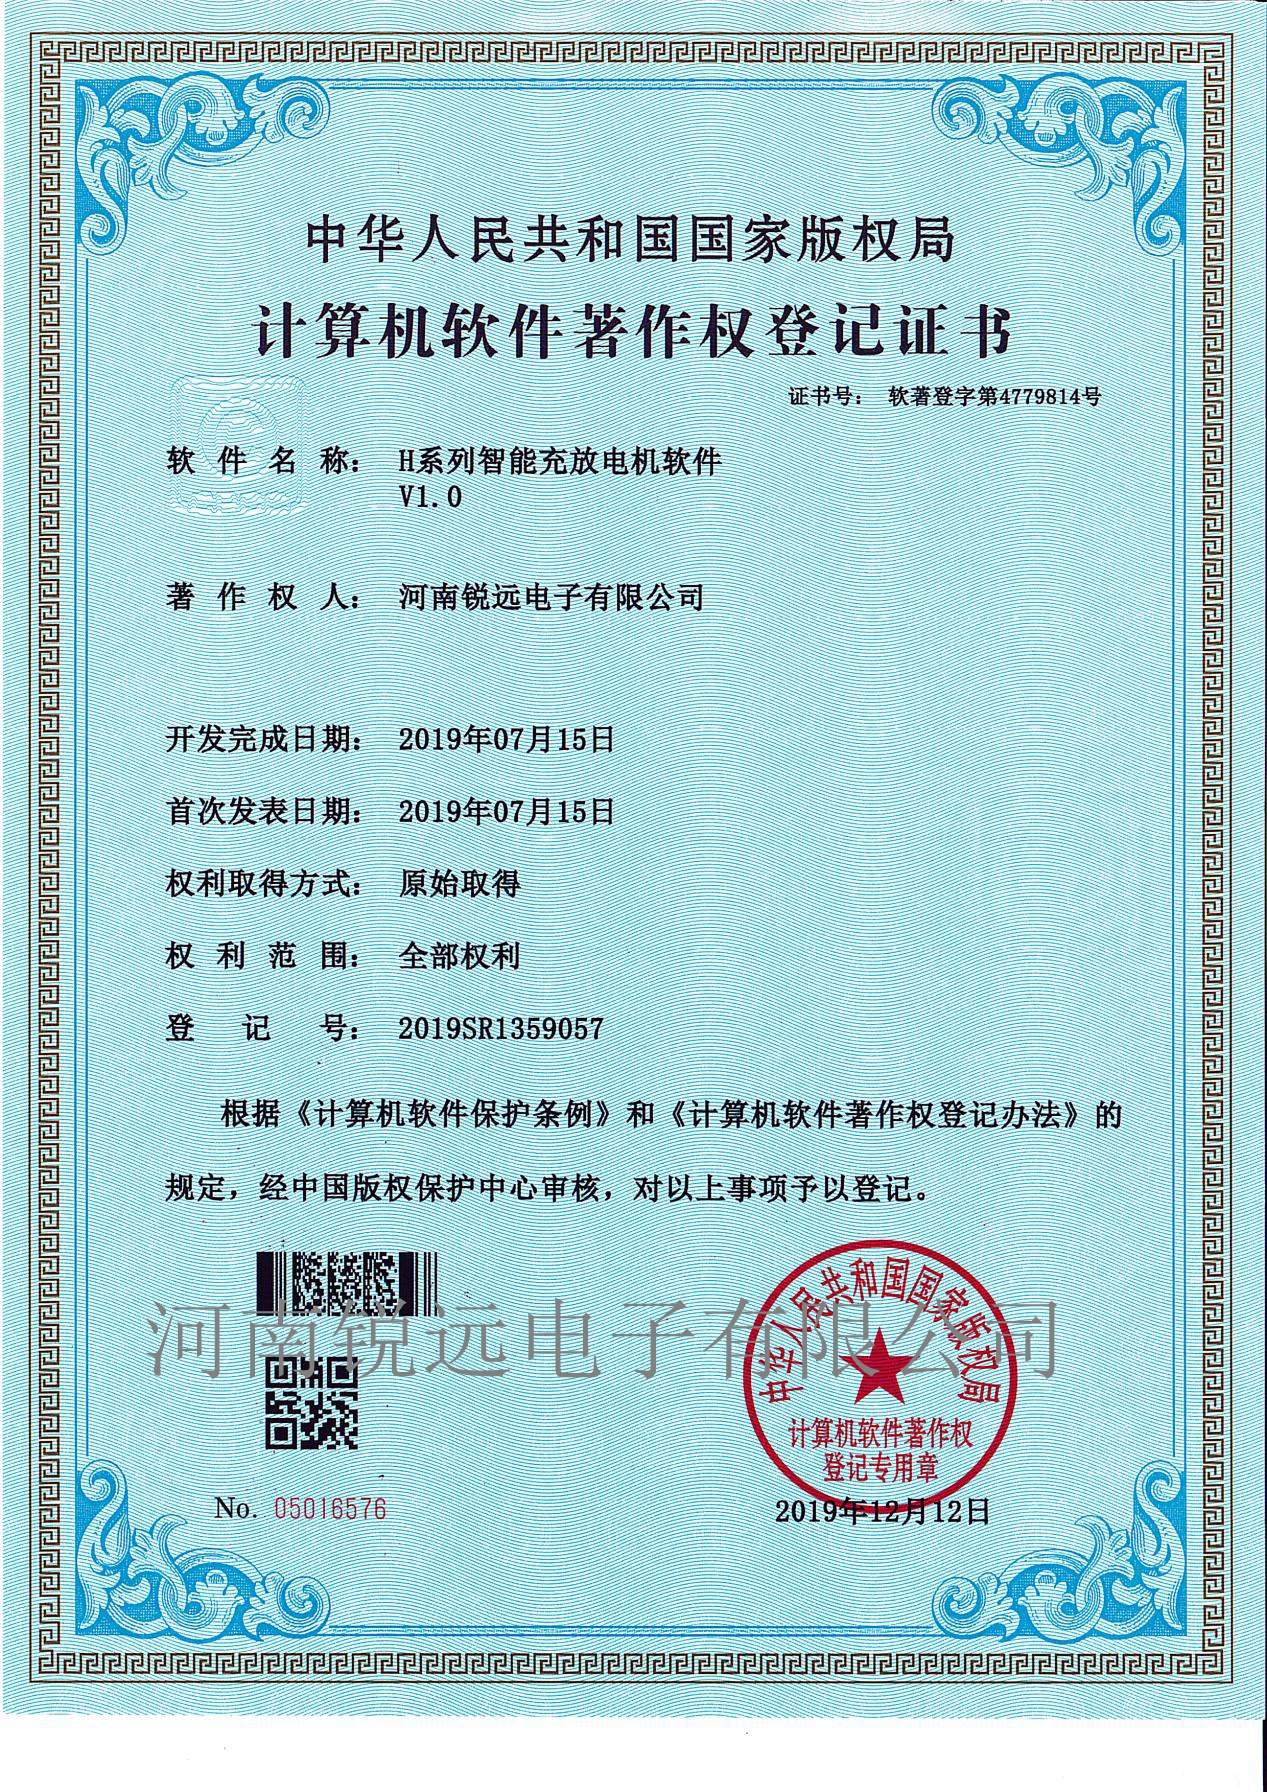 H贝斯特全球最奢华6666智能充放电机软件著作权